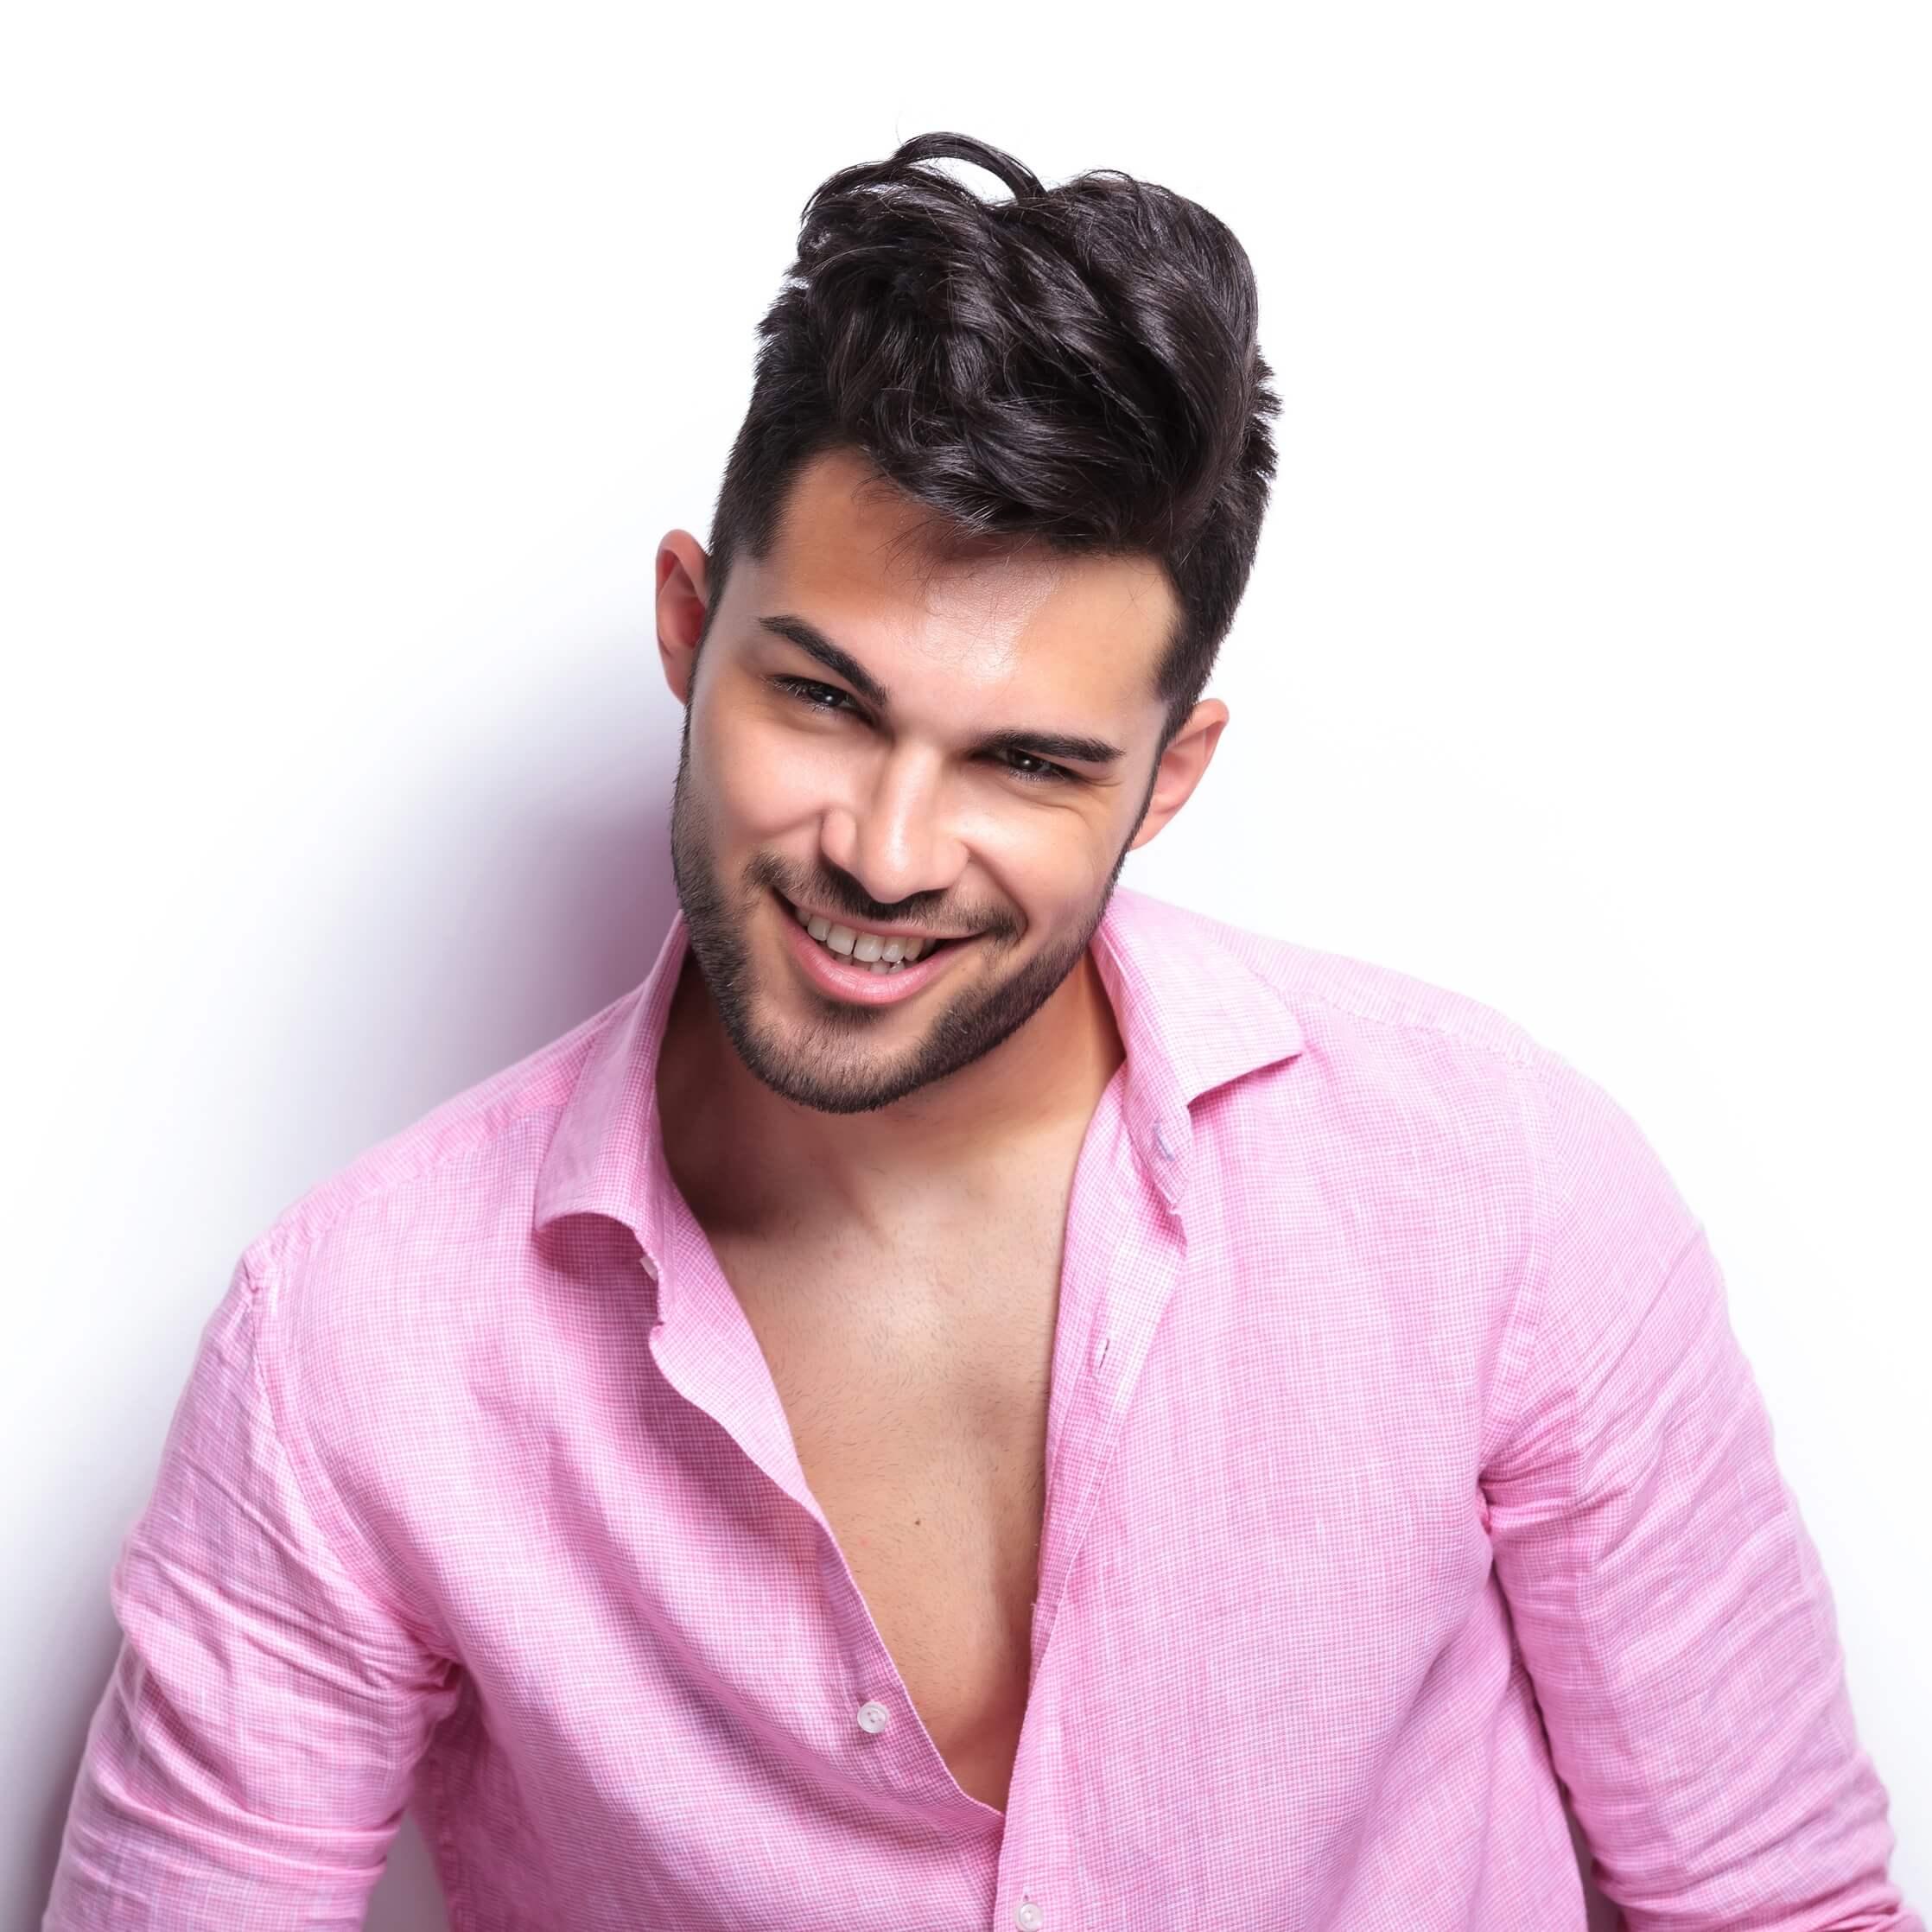 Men's Facials and Grooming